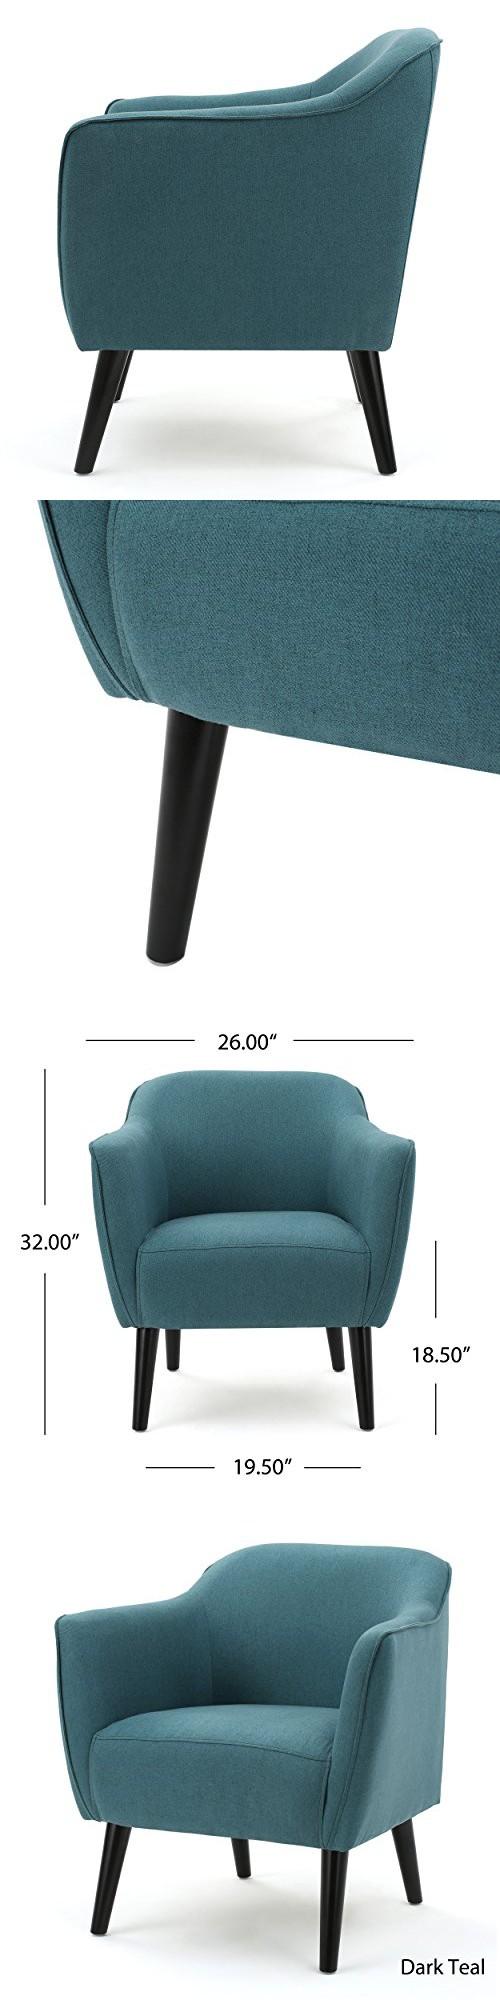 Tresten Dark Teal Mid Cenrtury Modern Fabric Office Arm Chair